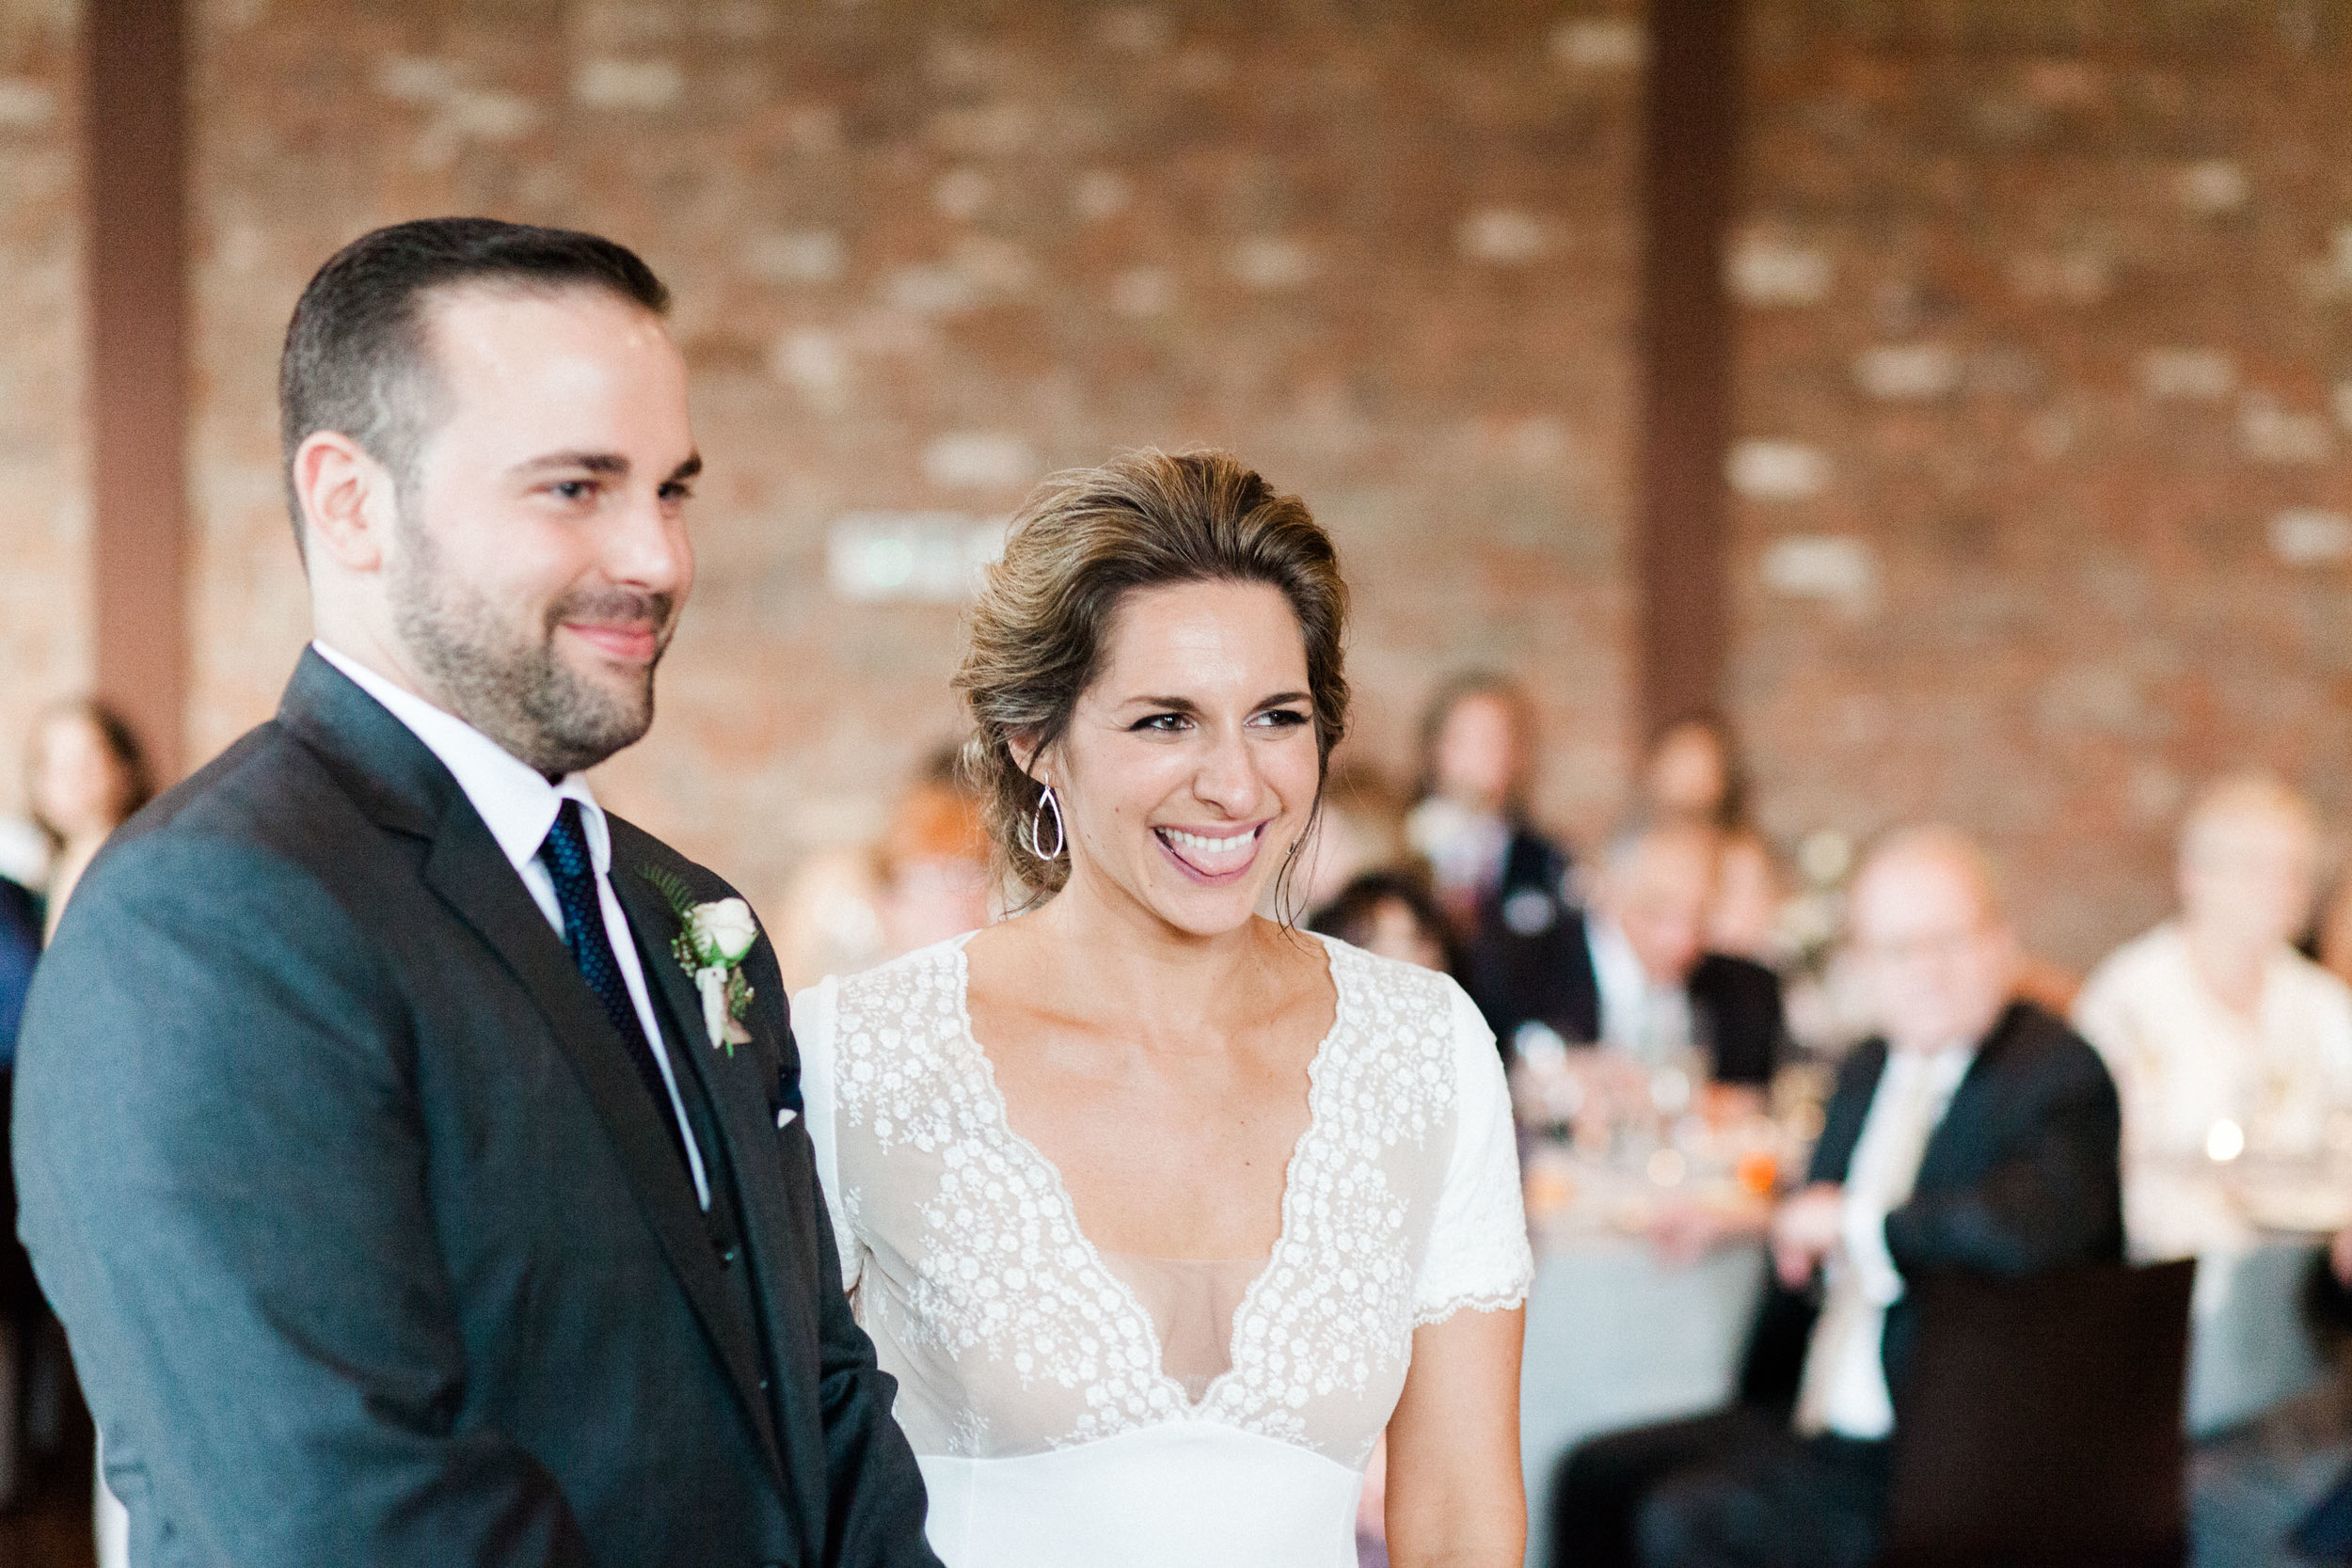 HiloandGinger-Brian+Dina_Weddingday_SneakPeek-57.jpg